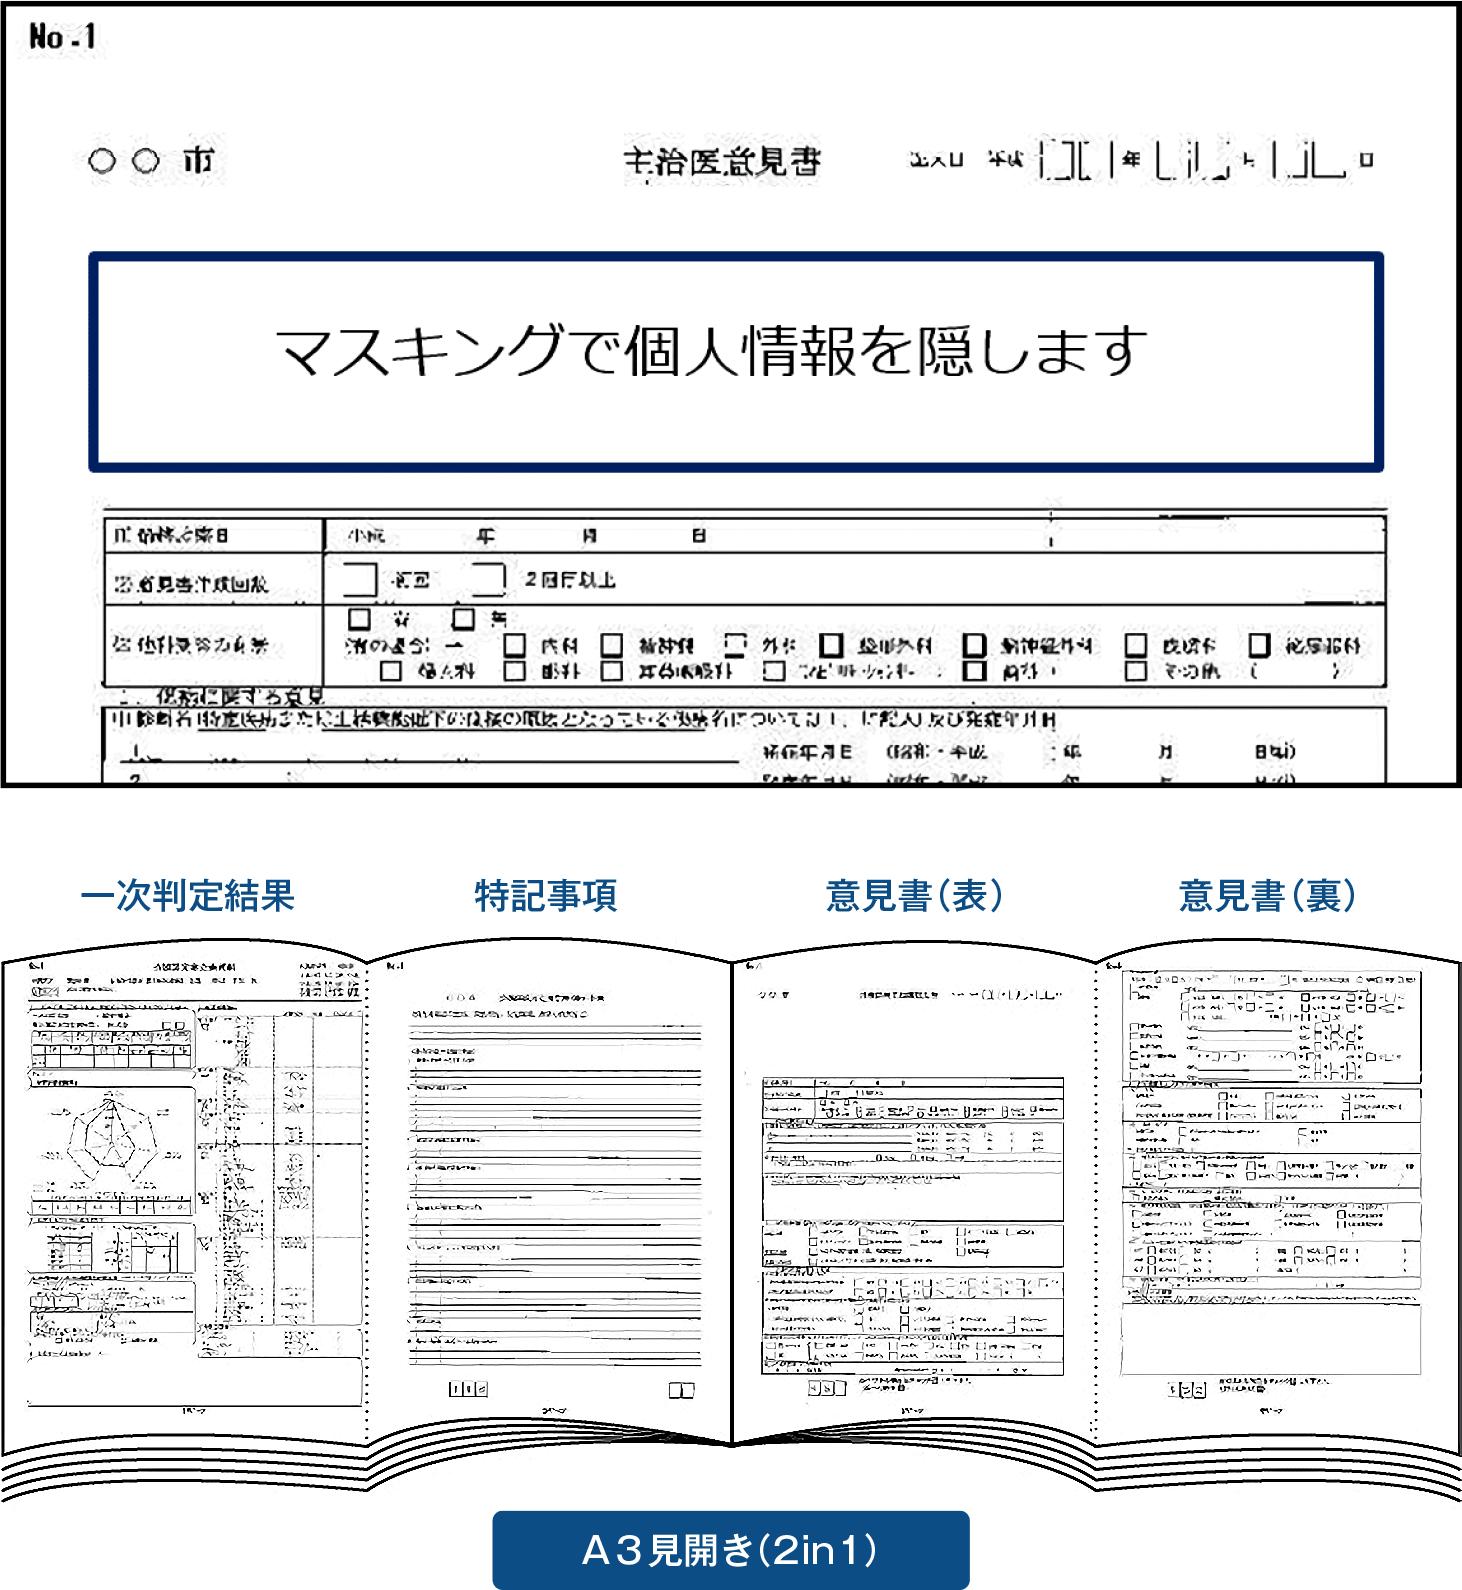 signa-syogai-image06.jpg